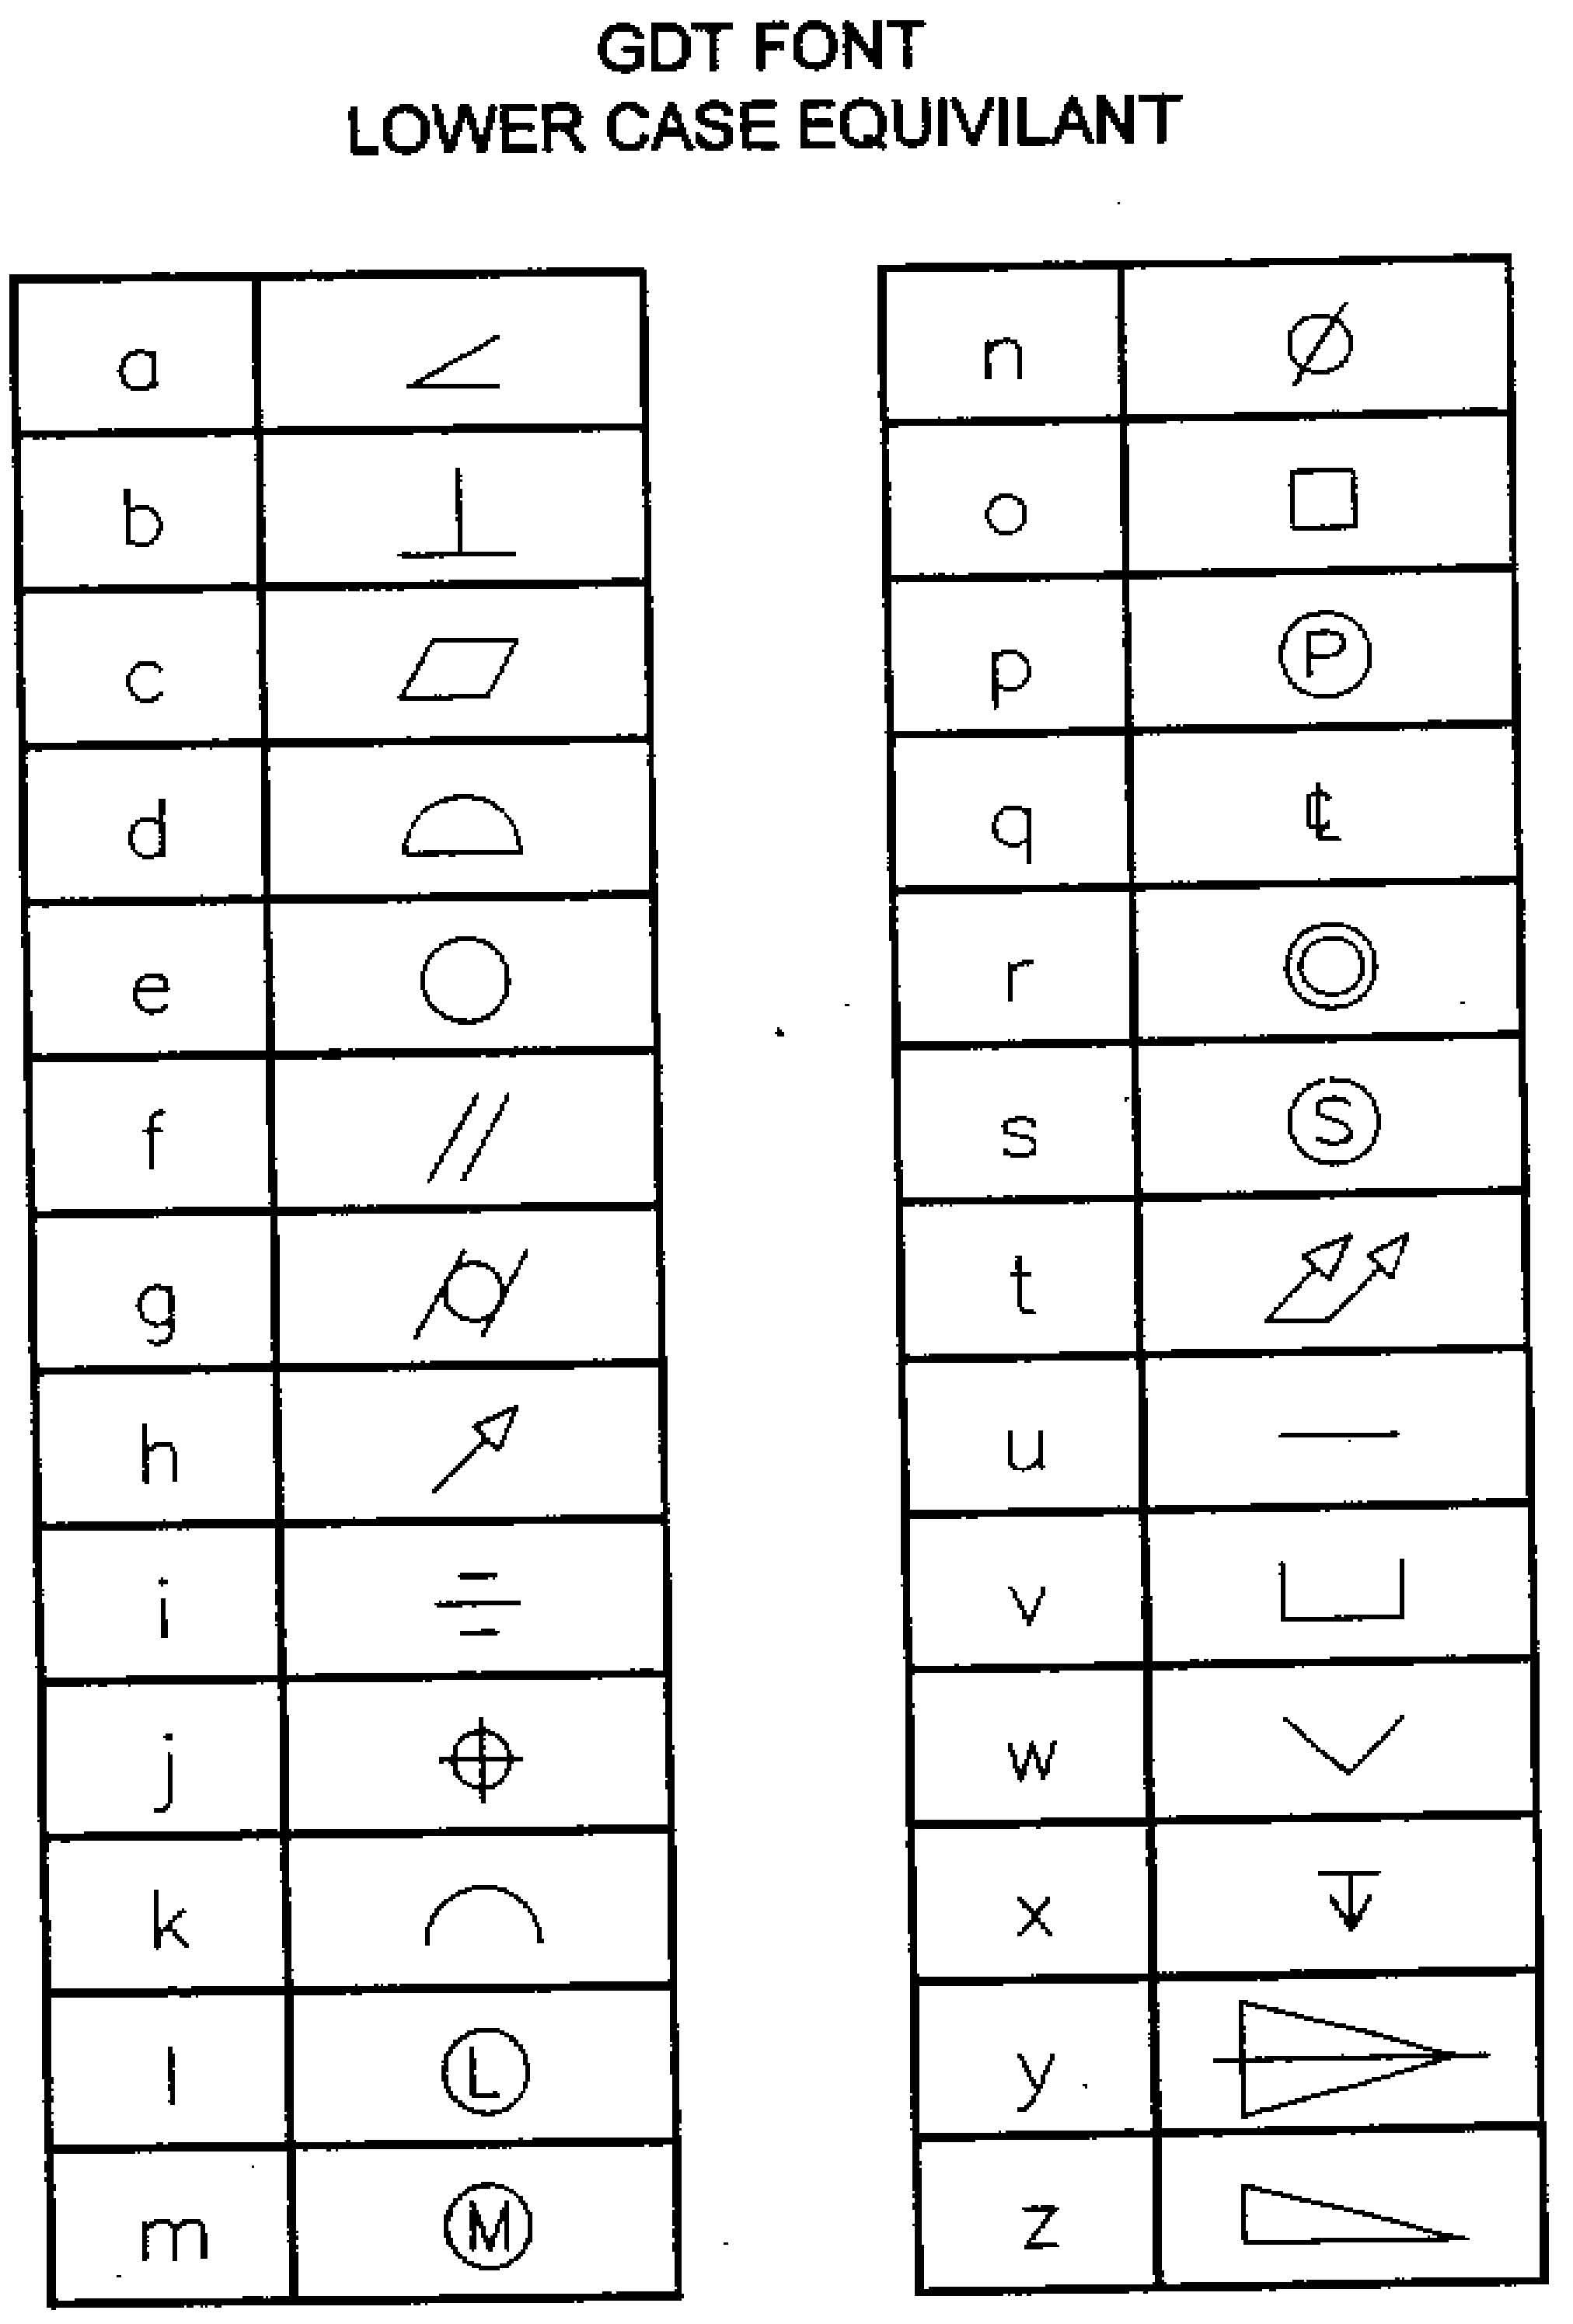 Electrical Wiring Drawing Symbols